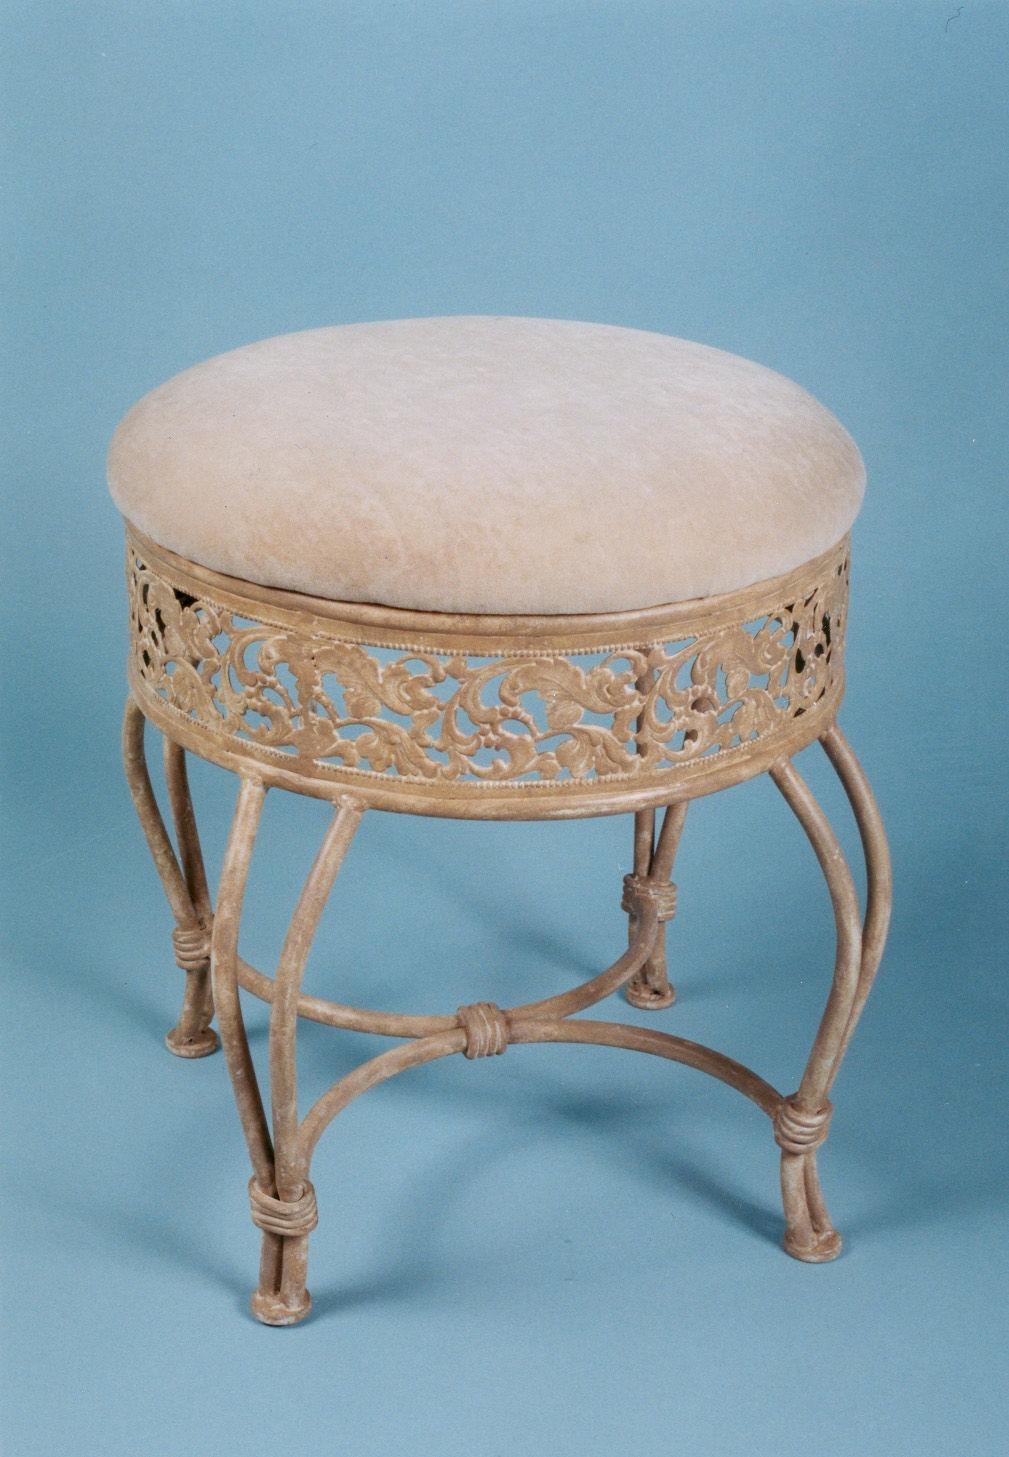 Hillsdale Furniture Bedroom Clover Vanity Stool 50958